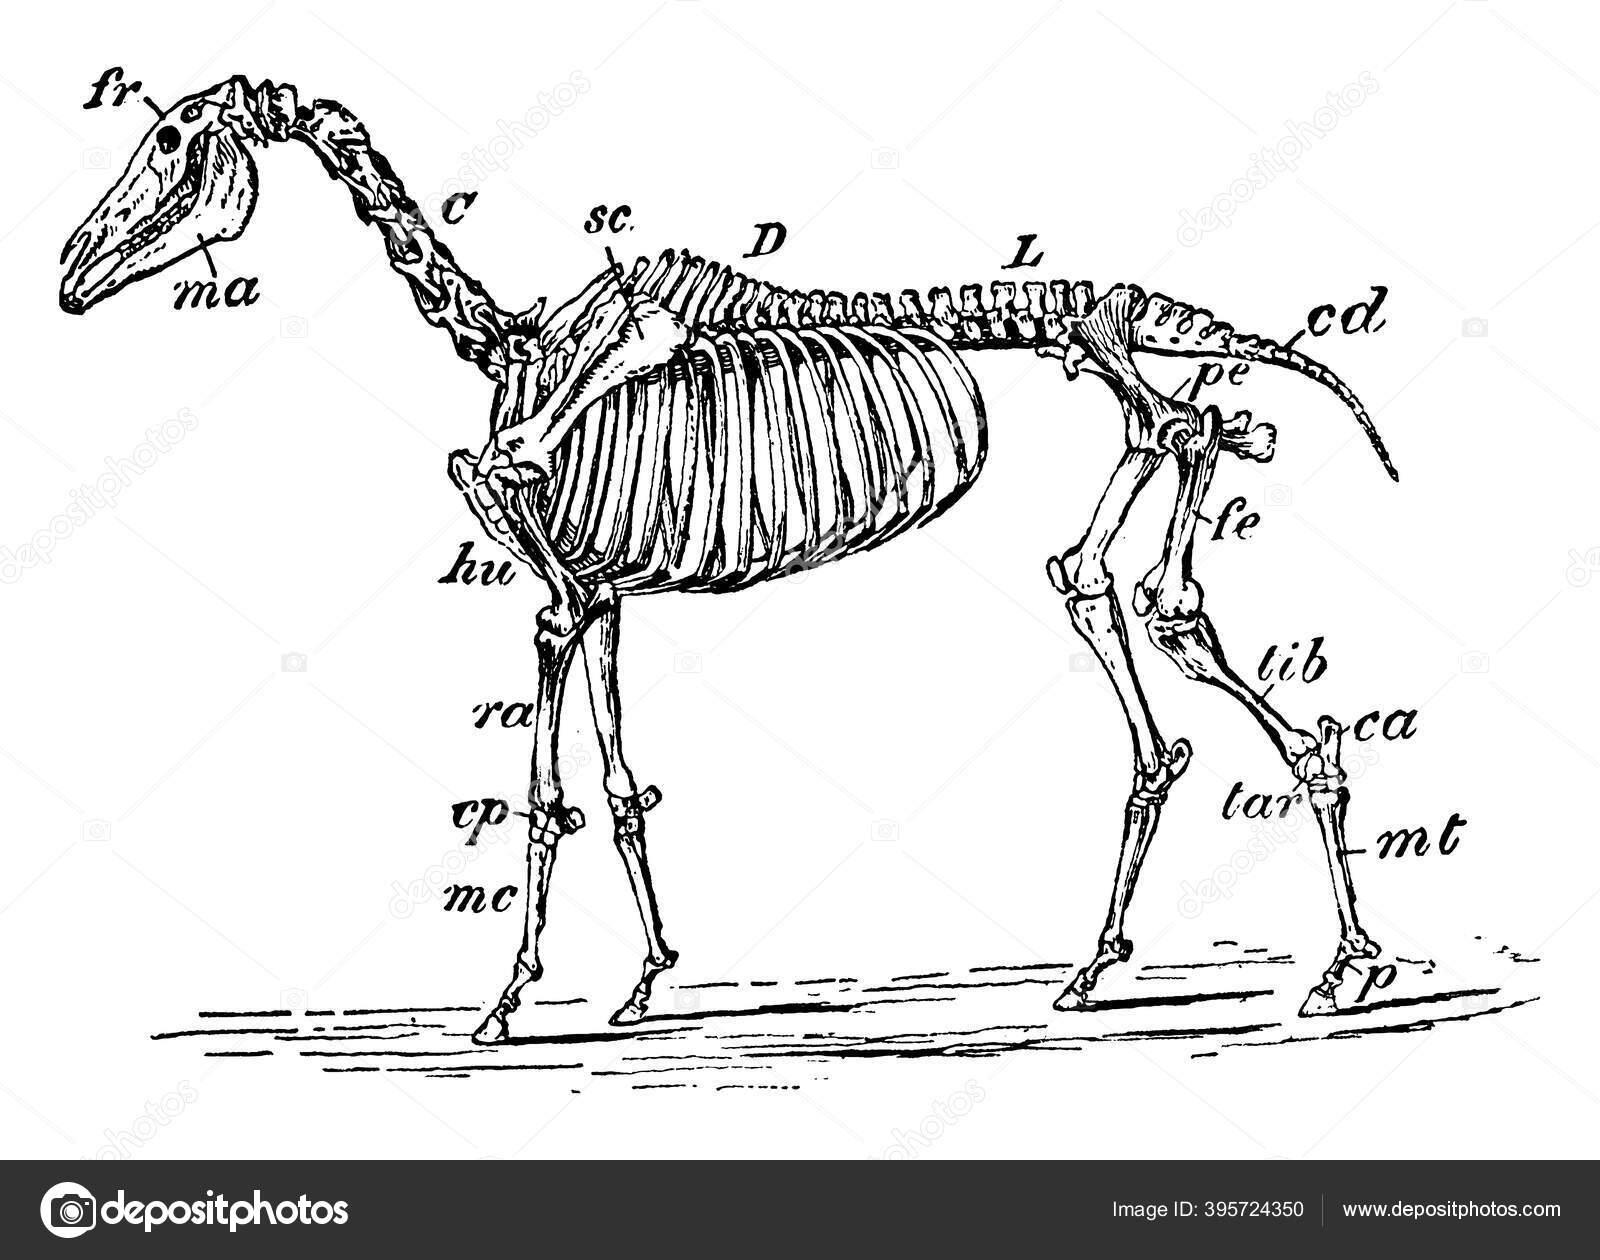 Skeleton Horse Its Parts Labelled Vintage Line Drawing Engraving Illustration Stock Vector C Morphart 395724350